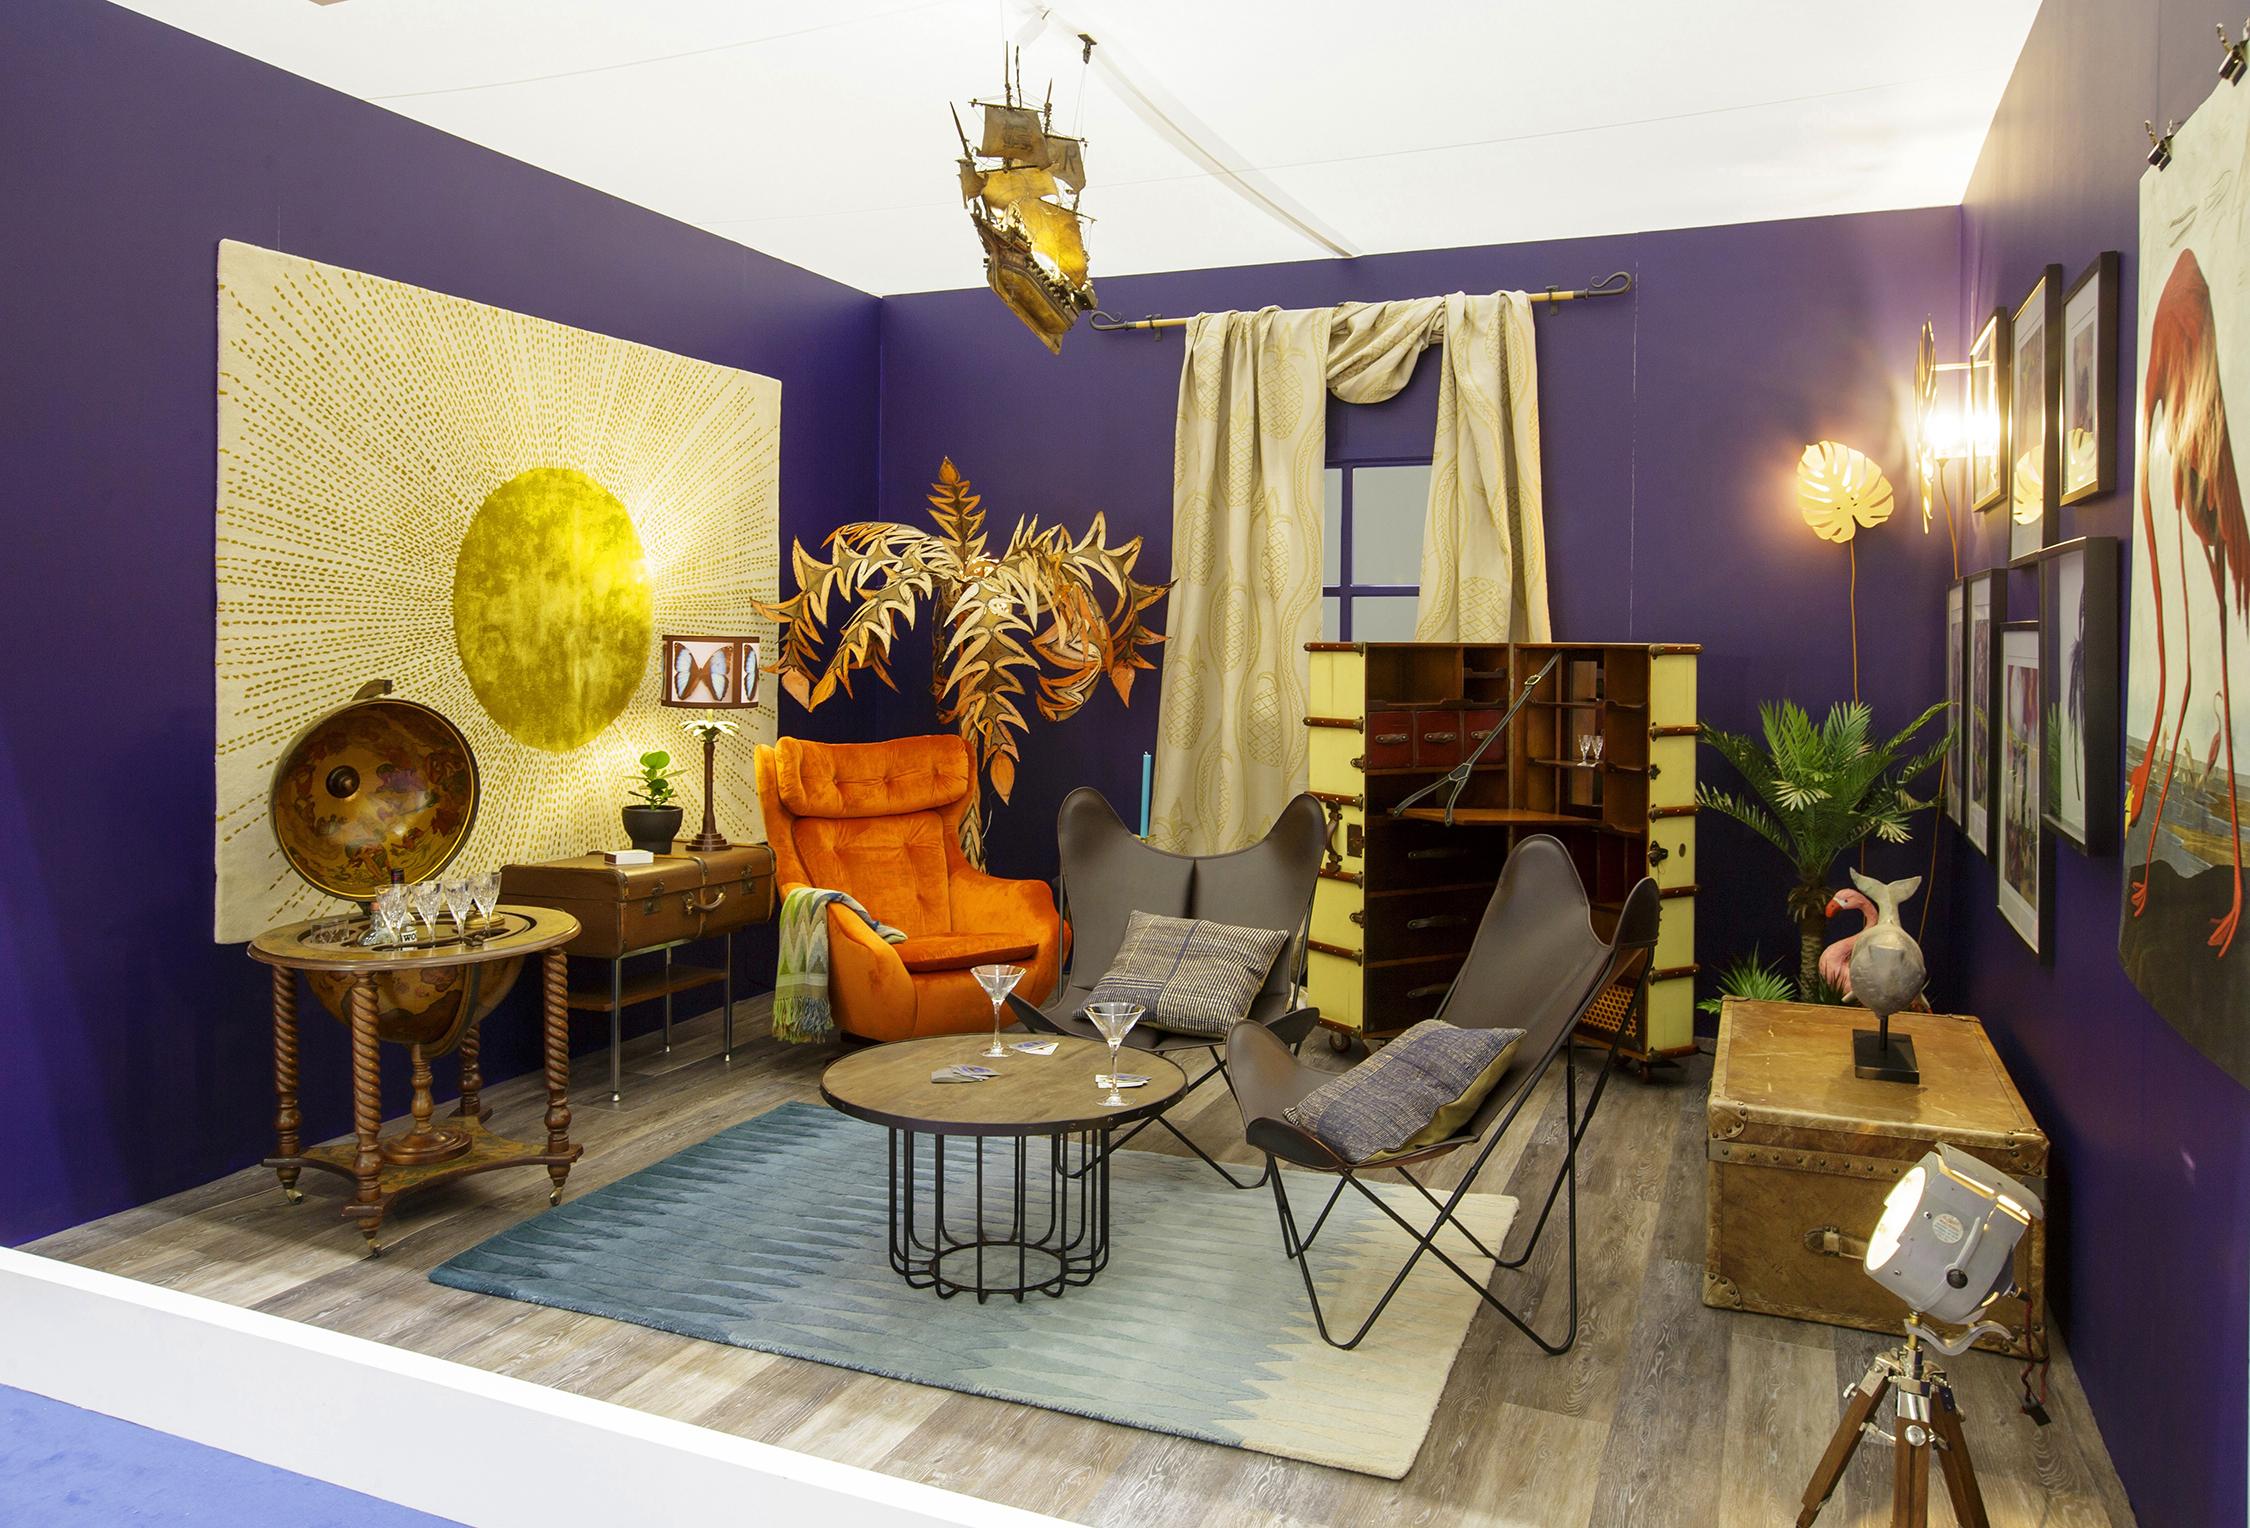 Grand Designs Live Neverland Roomset